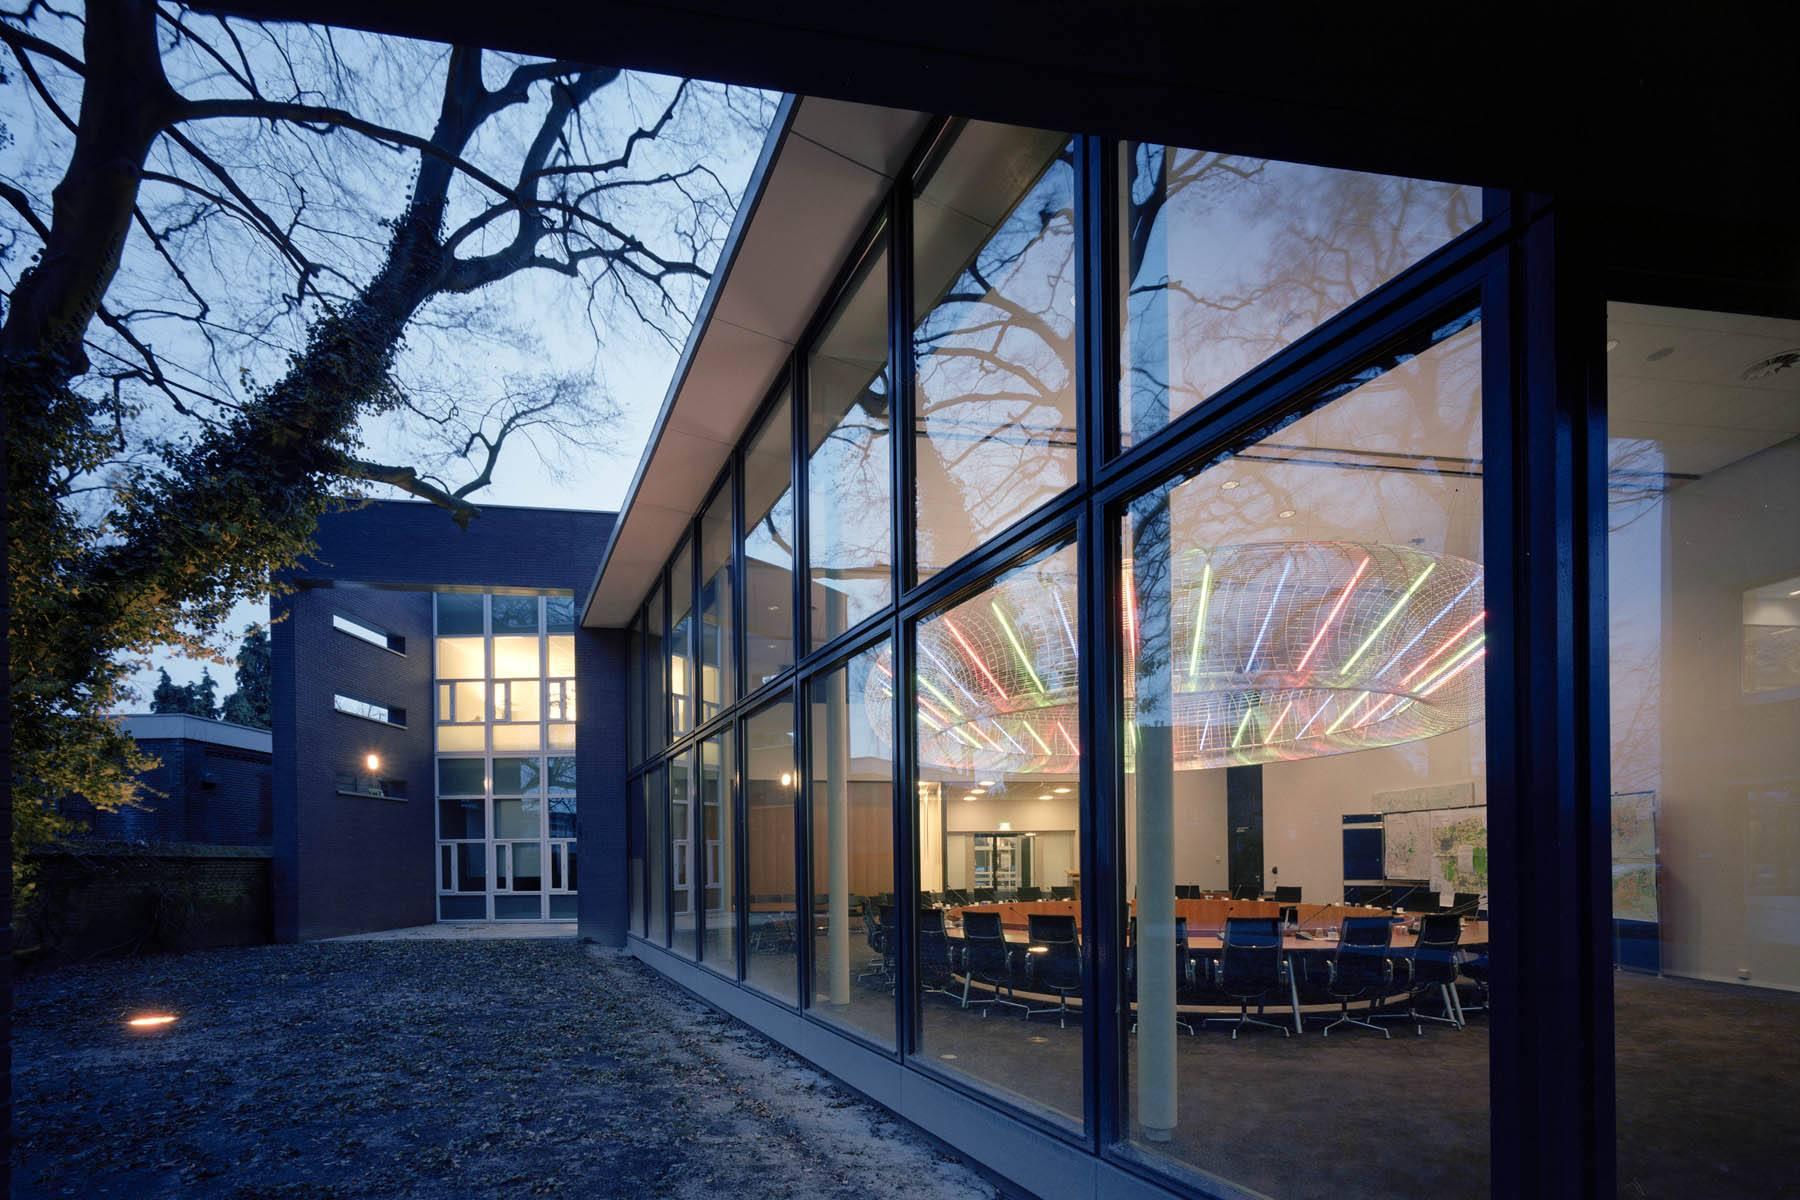 Lichtkunstwerk - Gemeentehuis Gemert Bakel / 2002